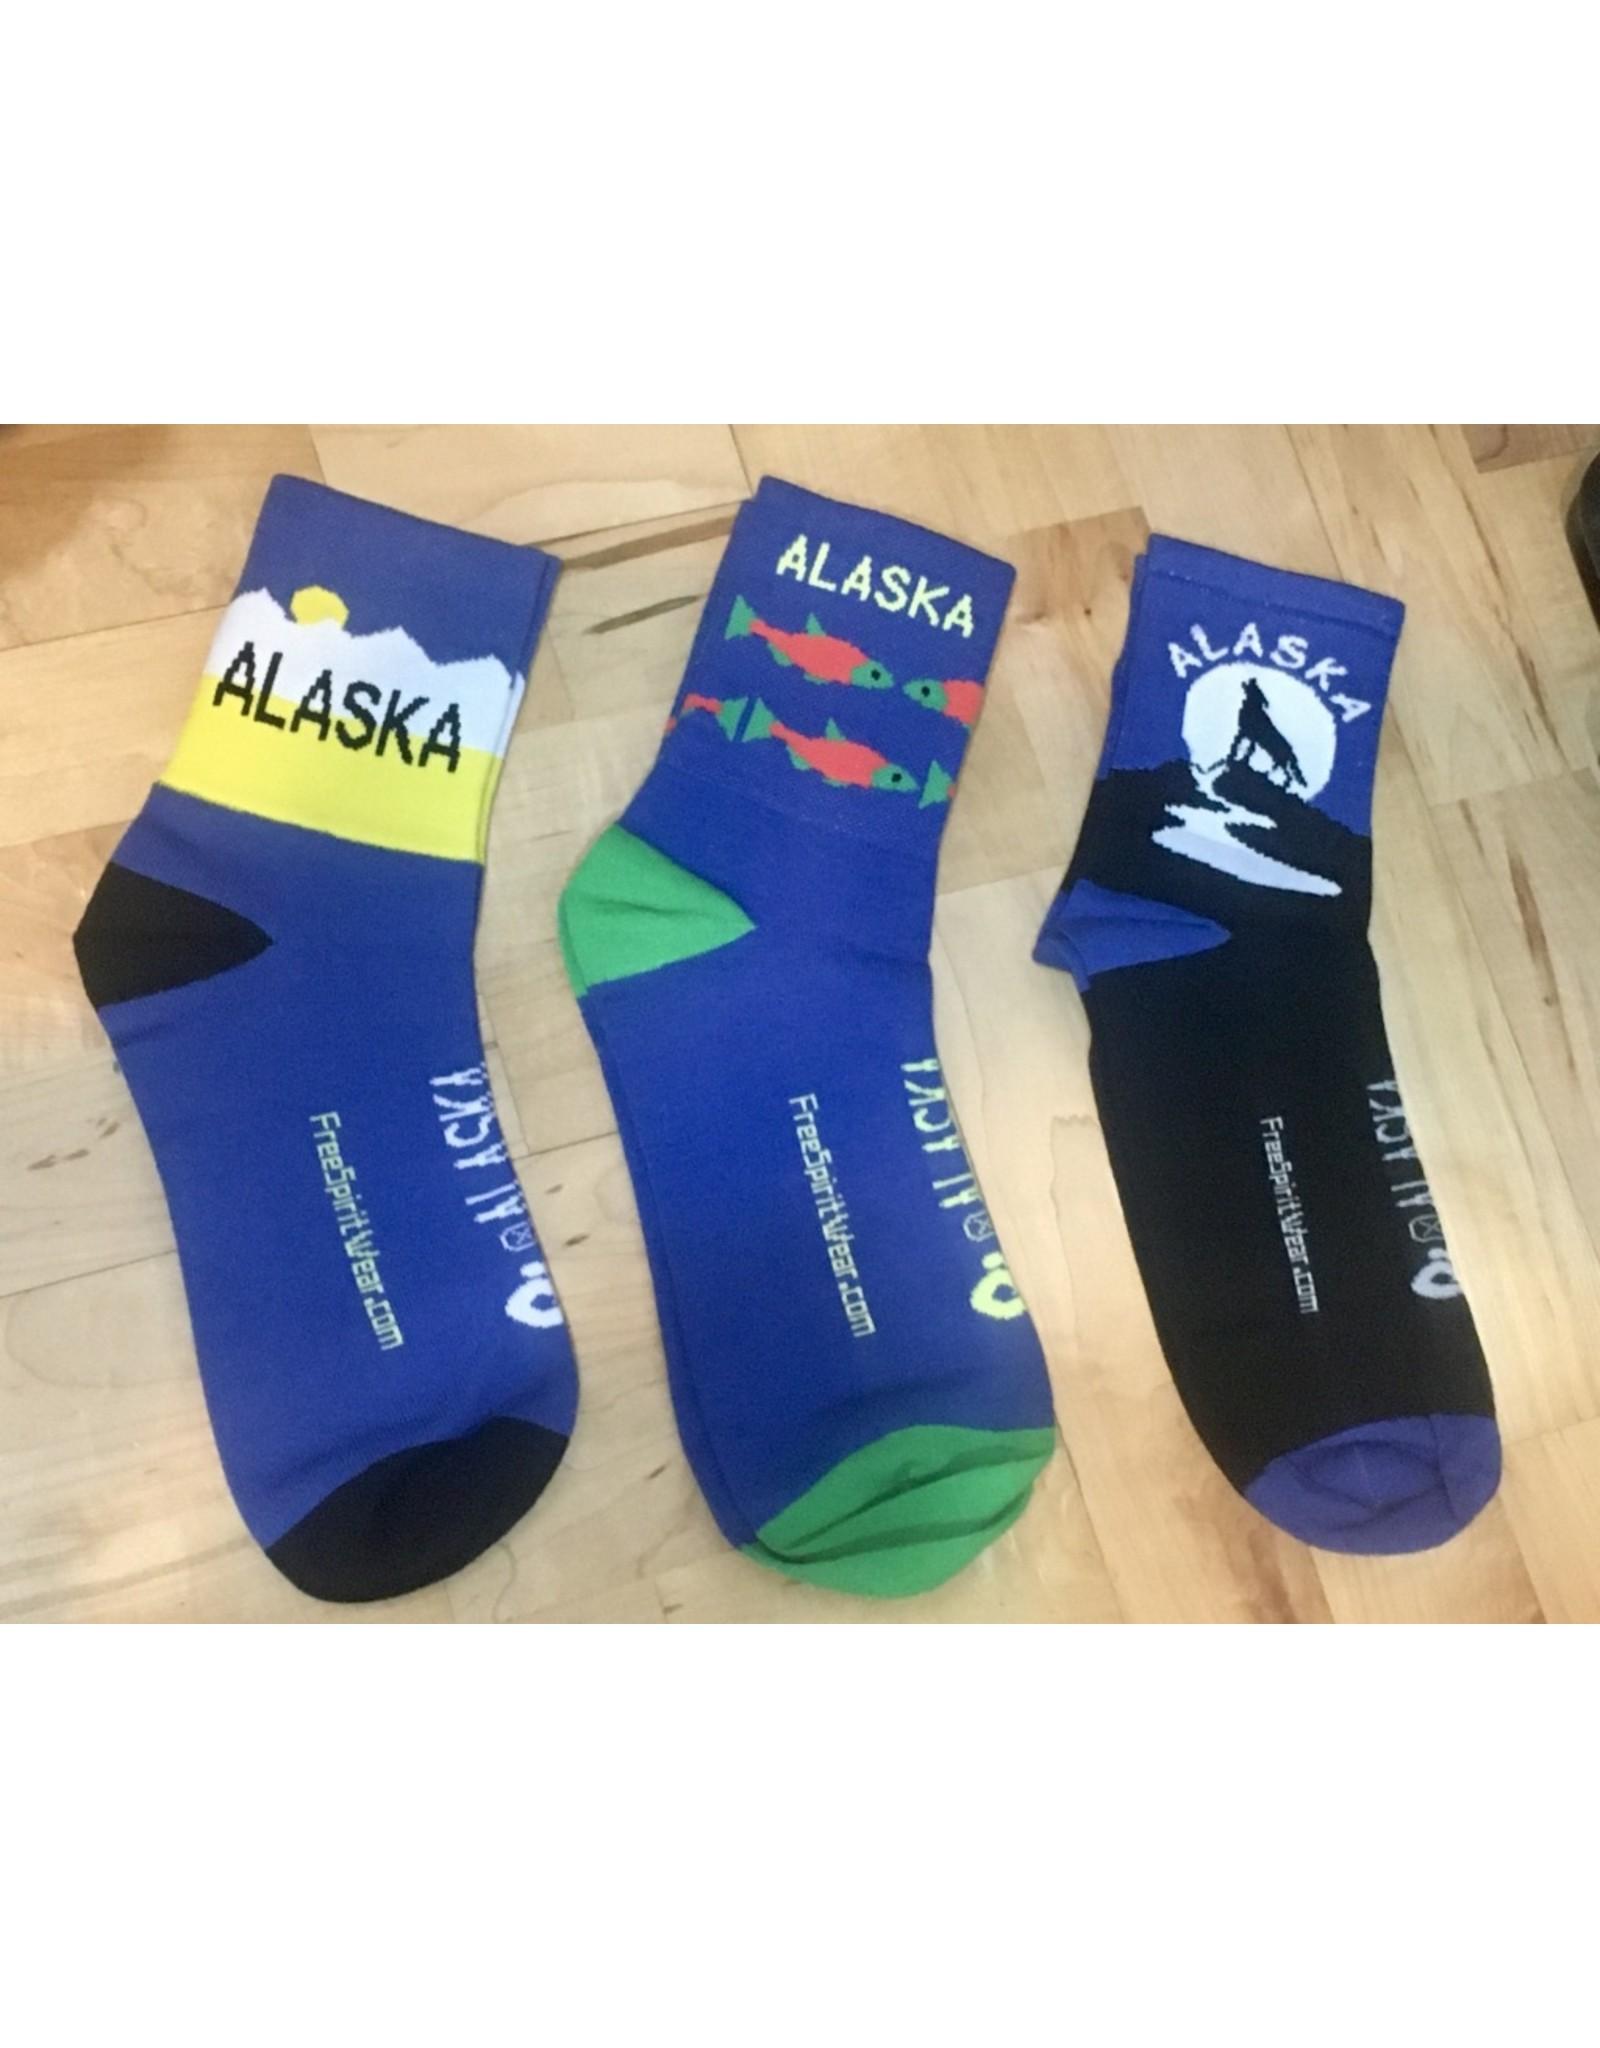 Free Spirit Socks Free Spirit Alaska Gold Rush